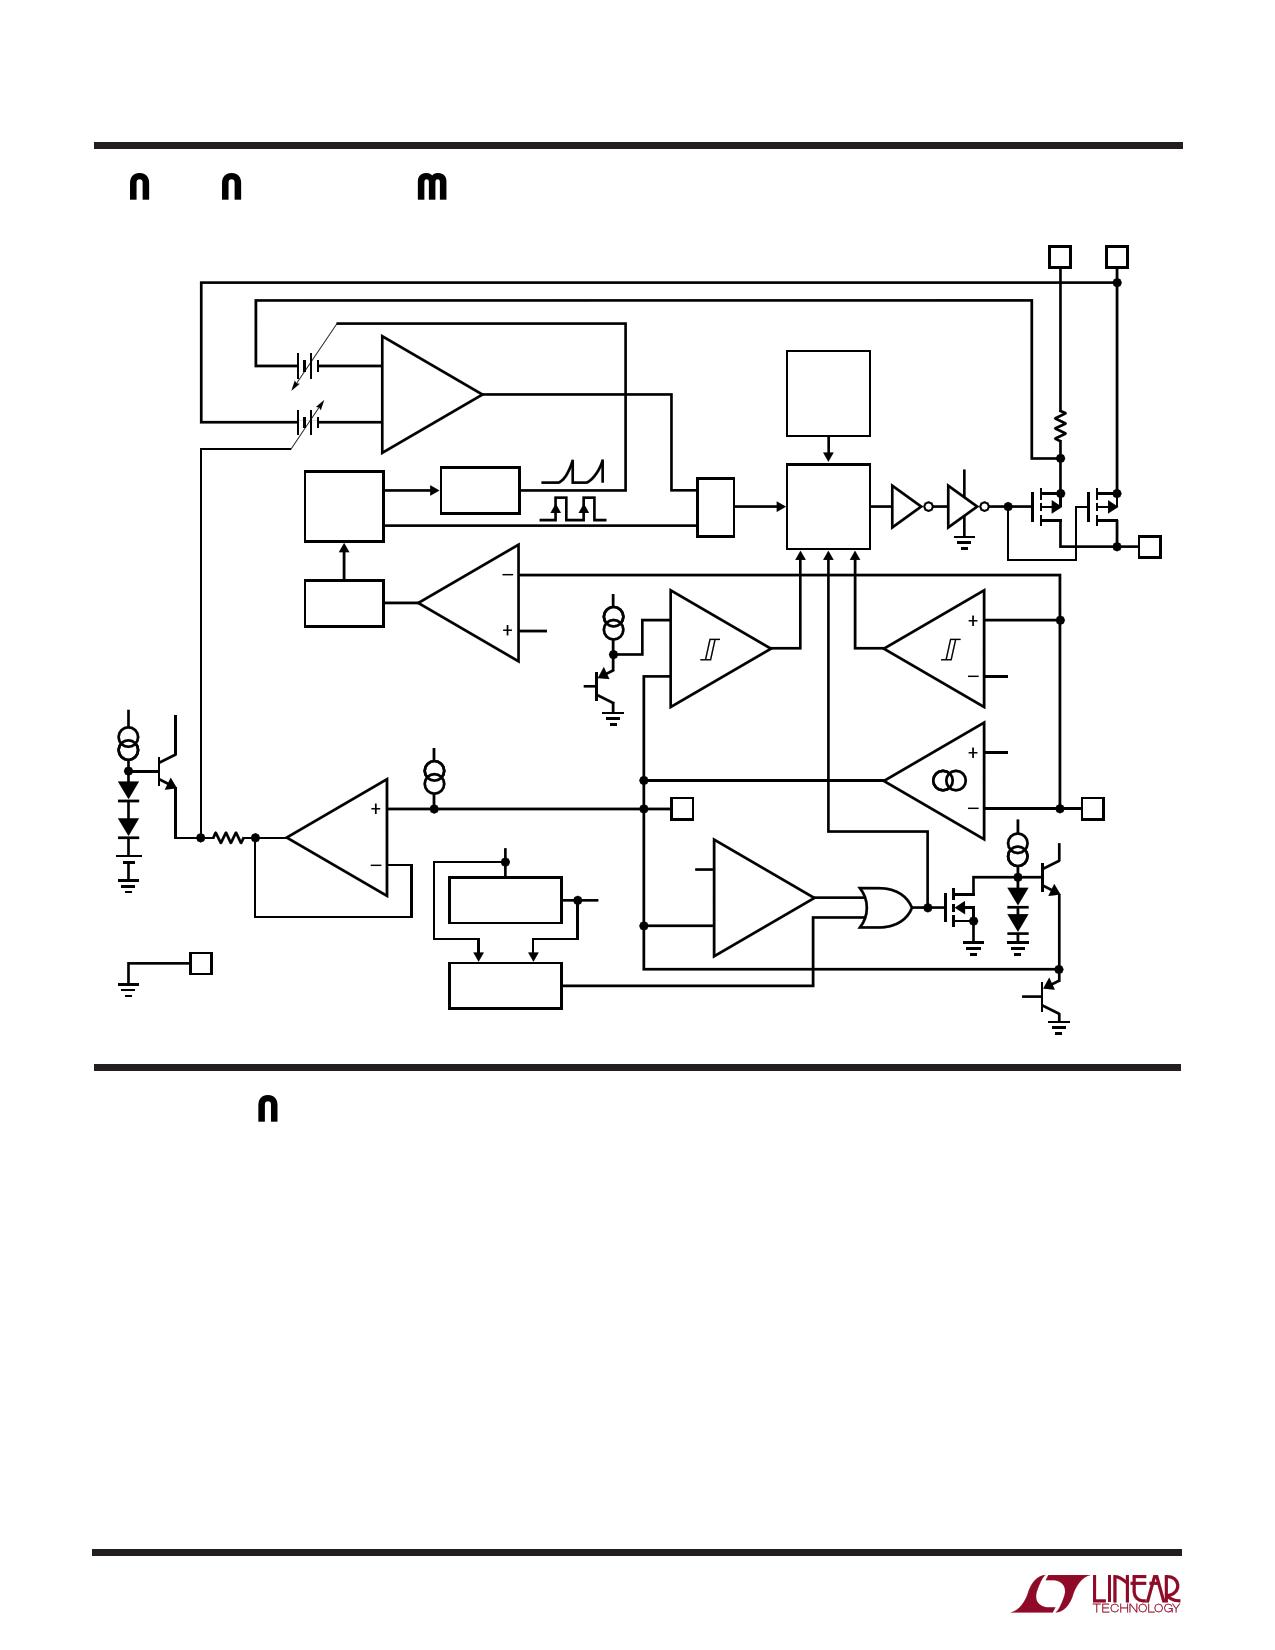 LTC1779 pdf, 반도체, 판매, 대치품